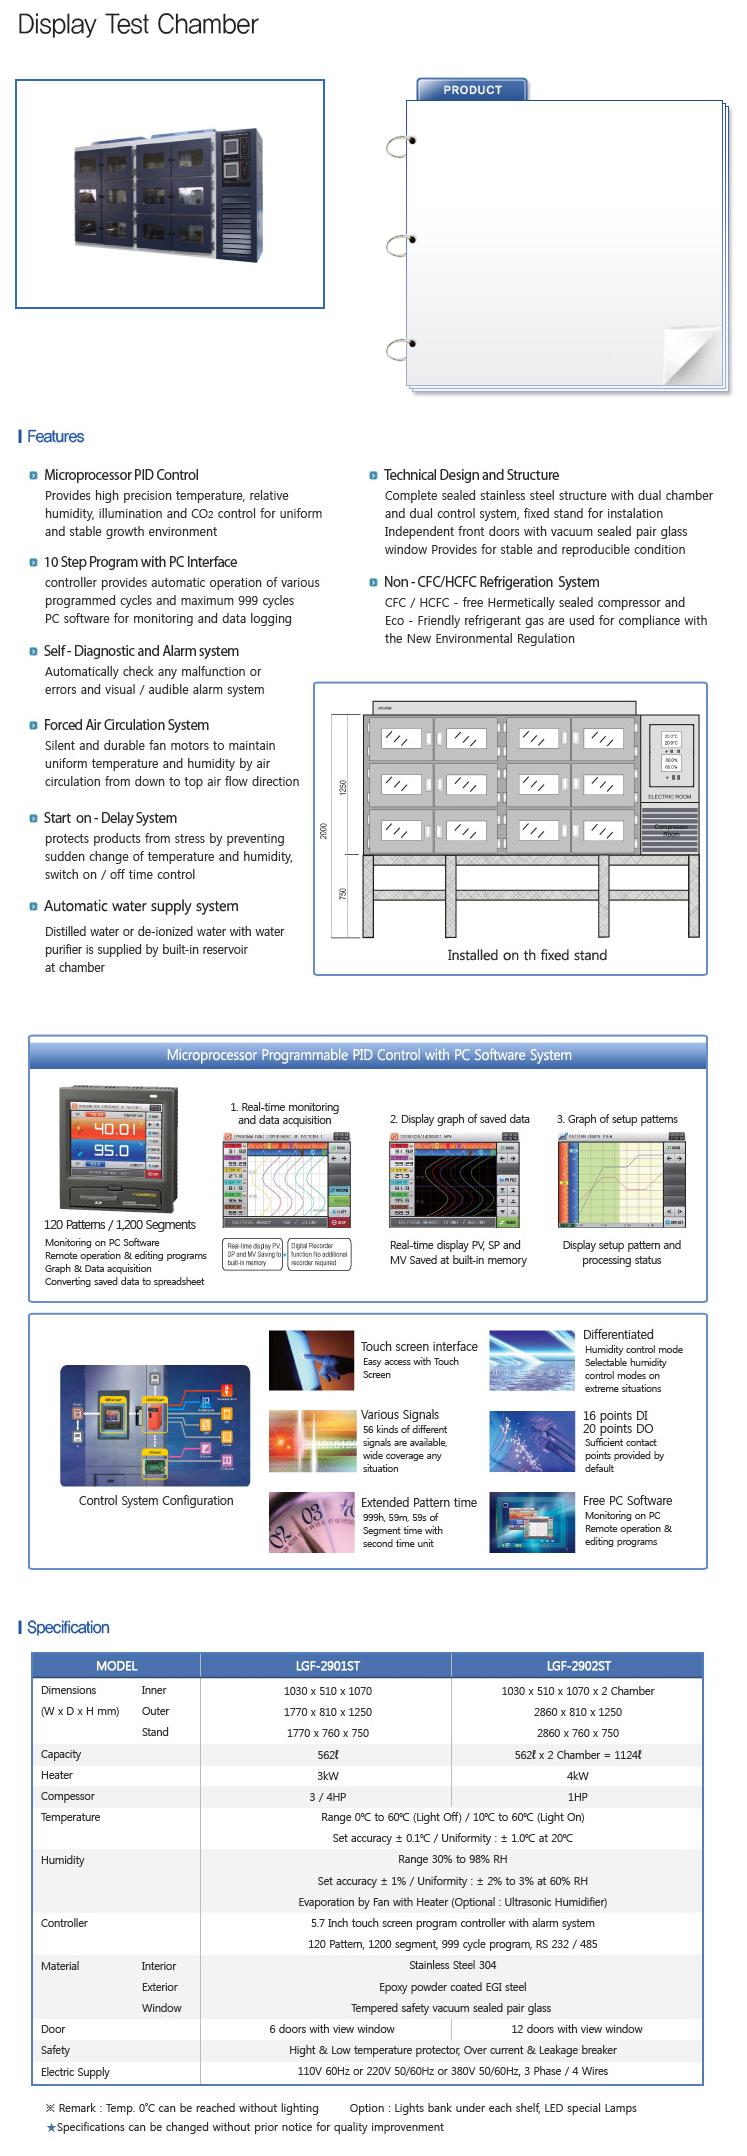 LABTECH Display Test Chamber LGF-2901ST/2902ST